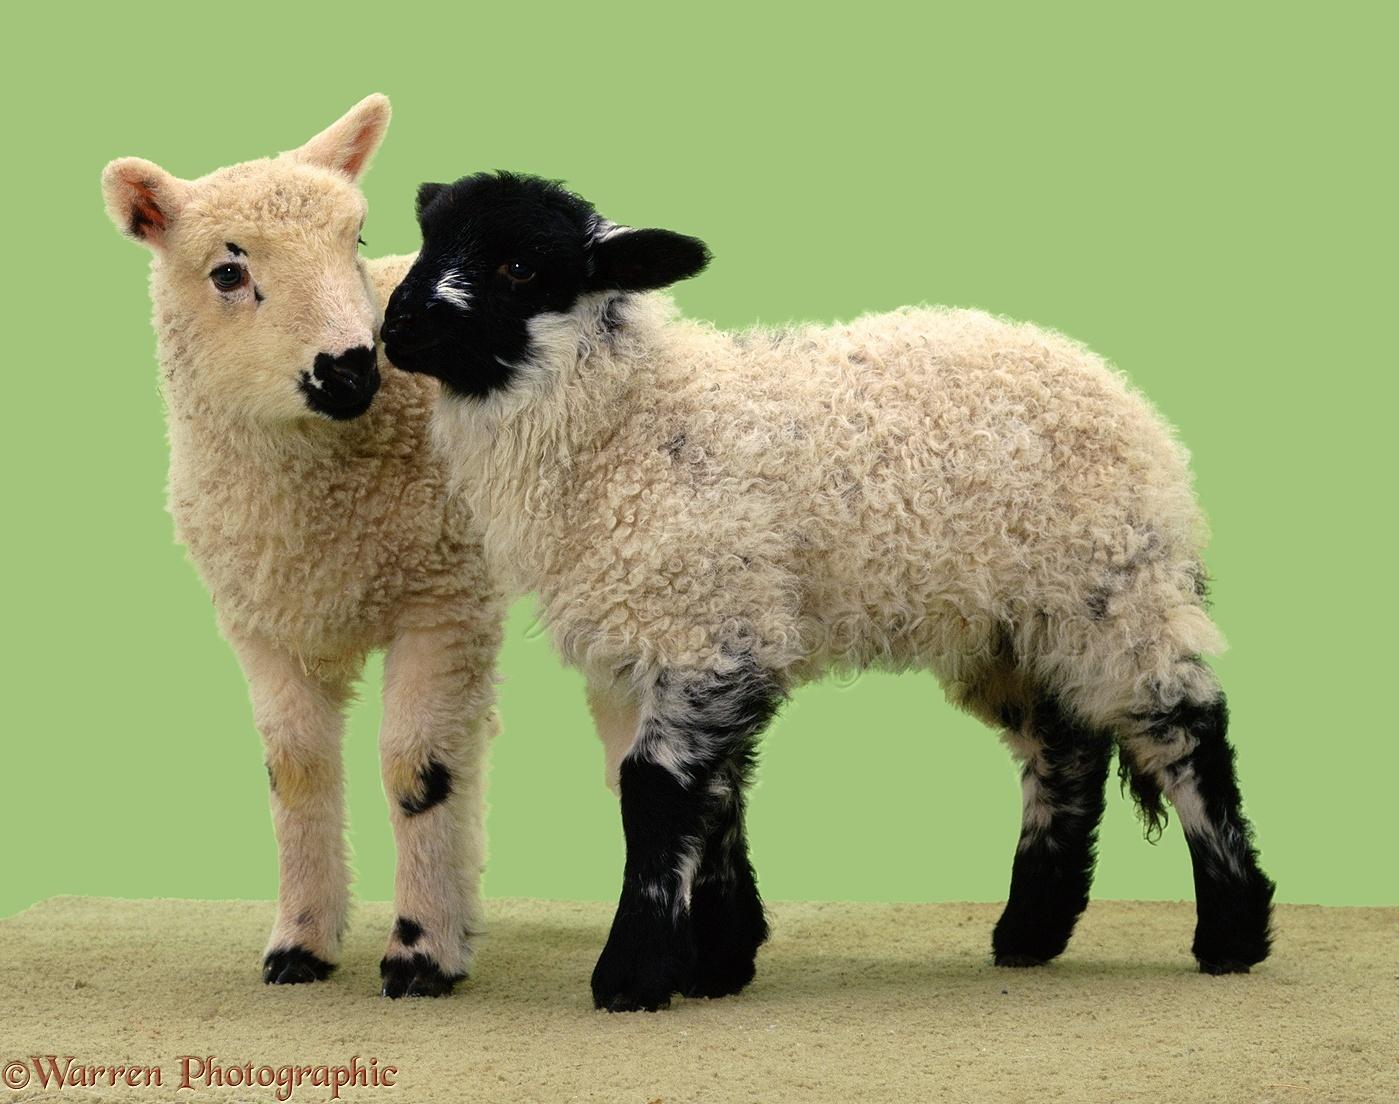 Two cute lambs photo WP02701